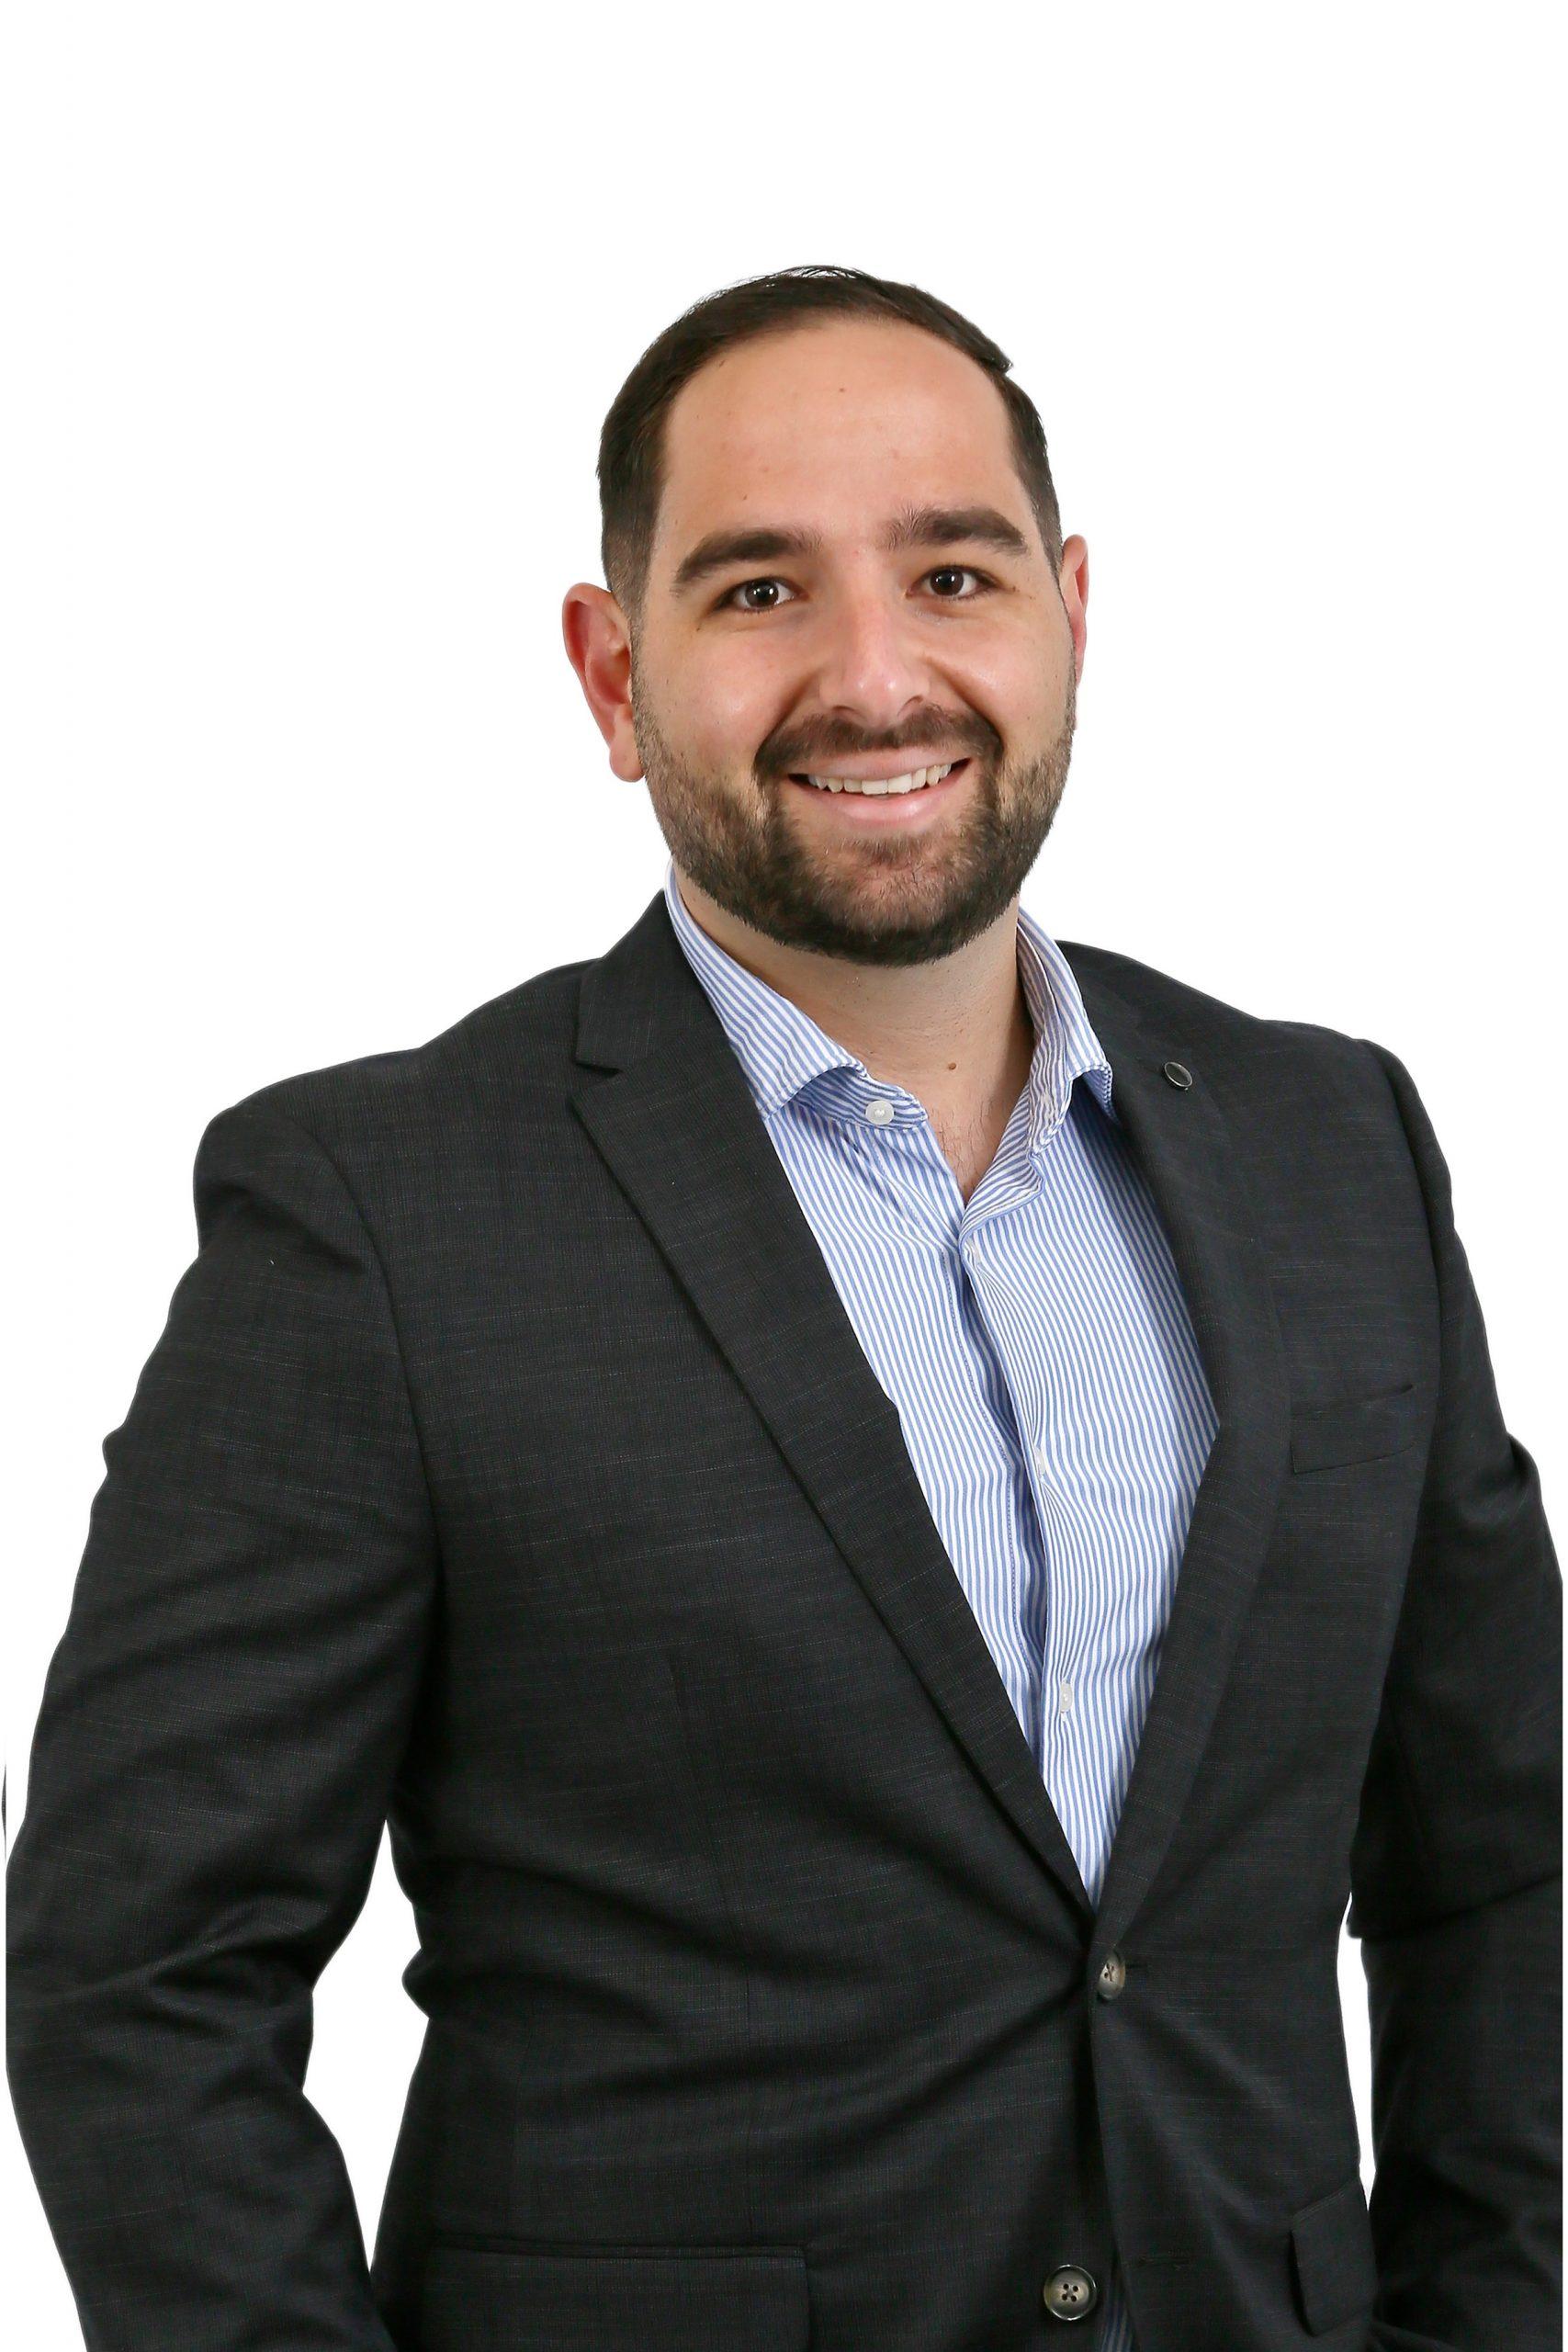 Luke Bavaro